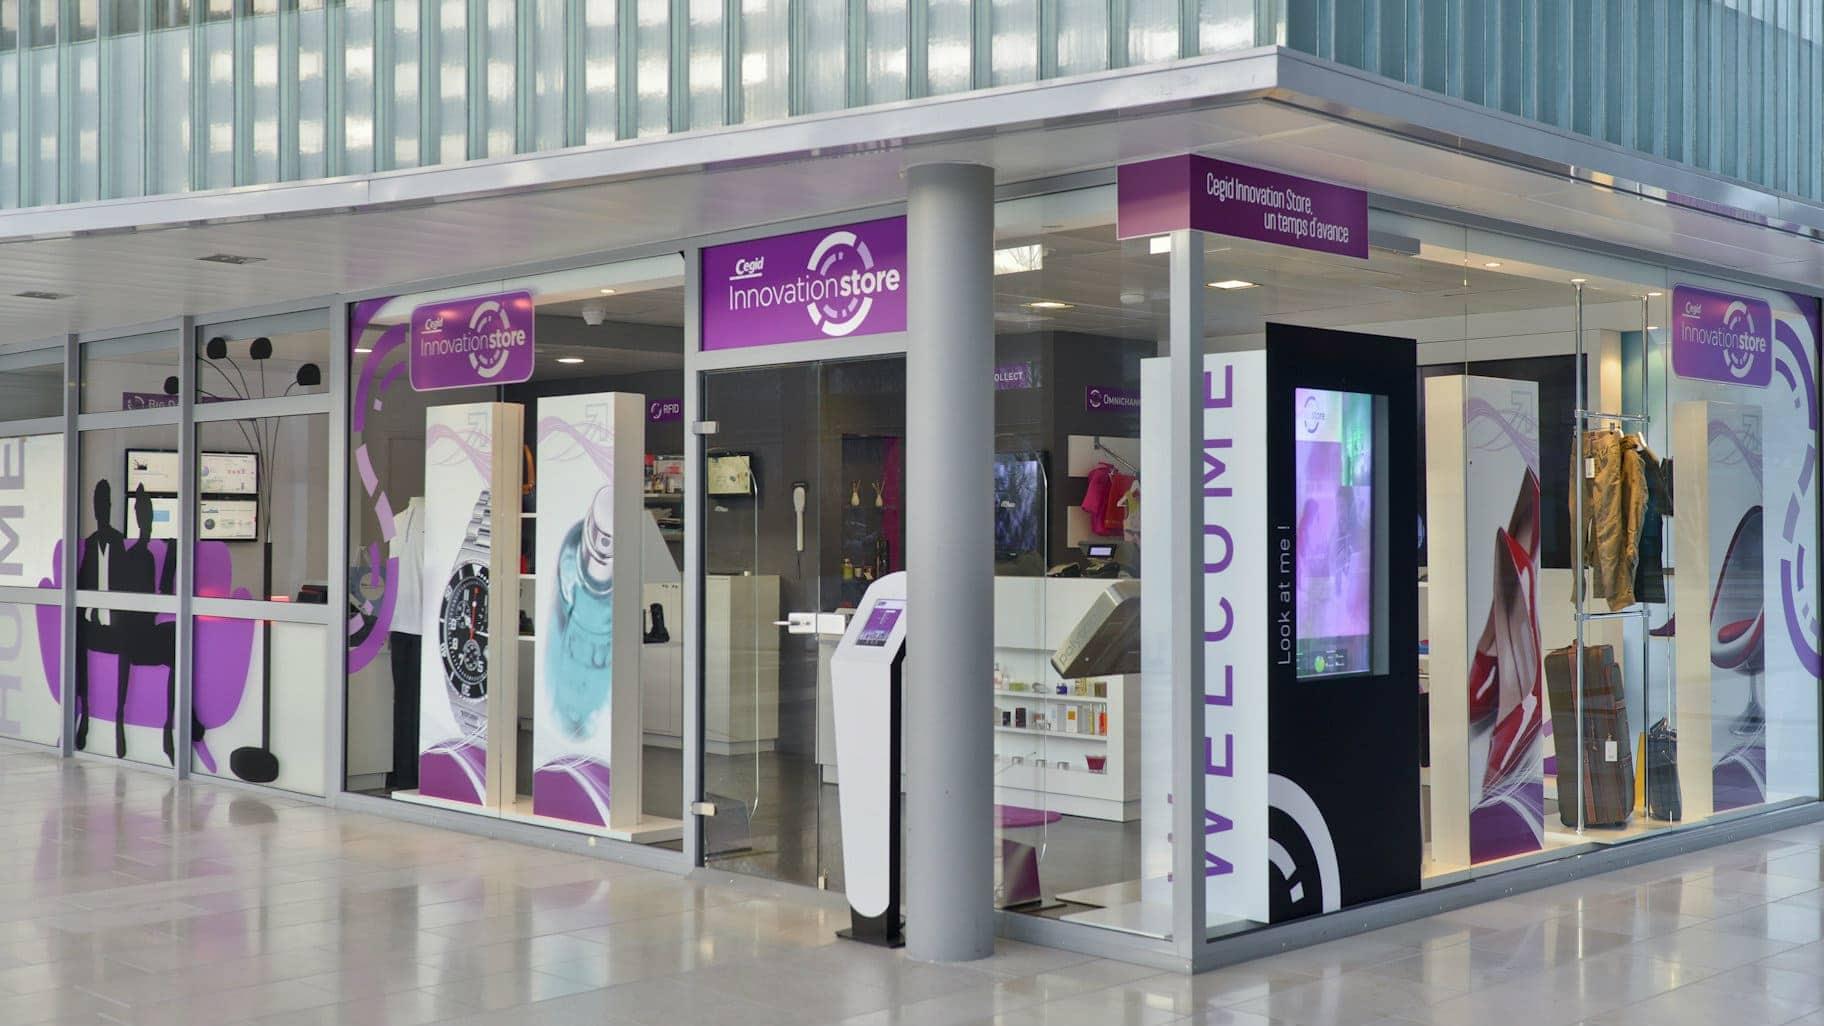 Cegid Innovation store